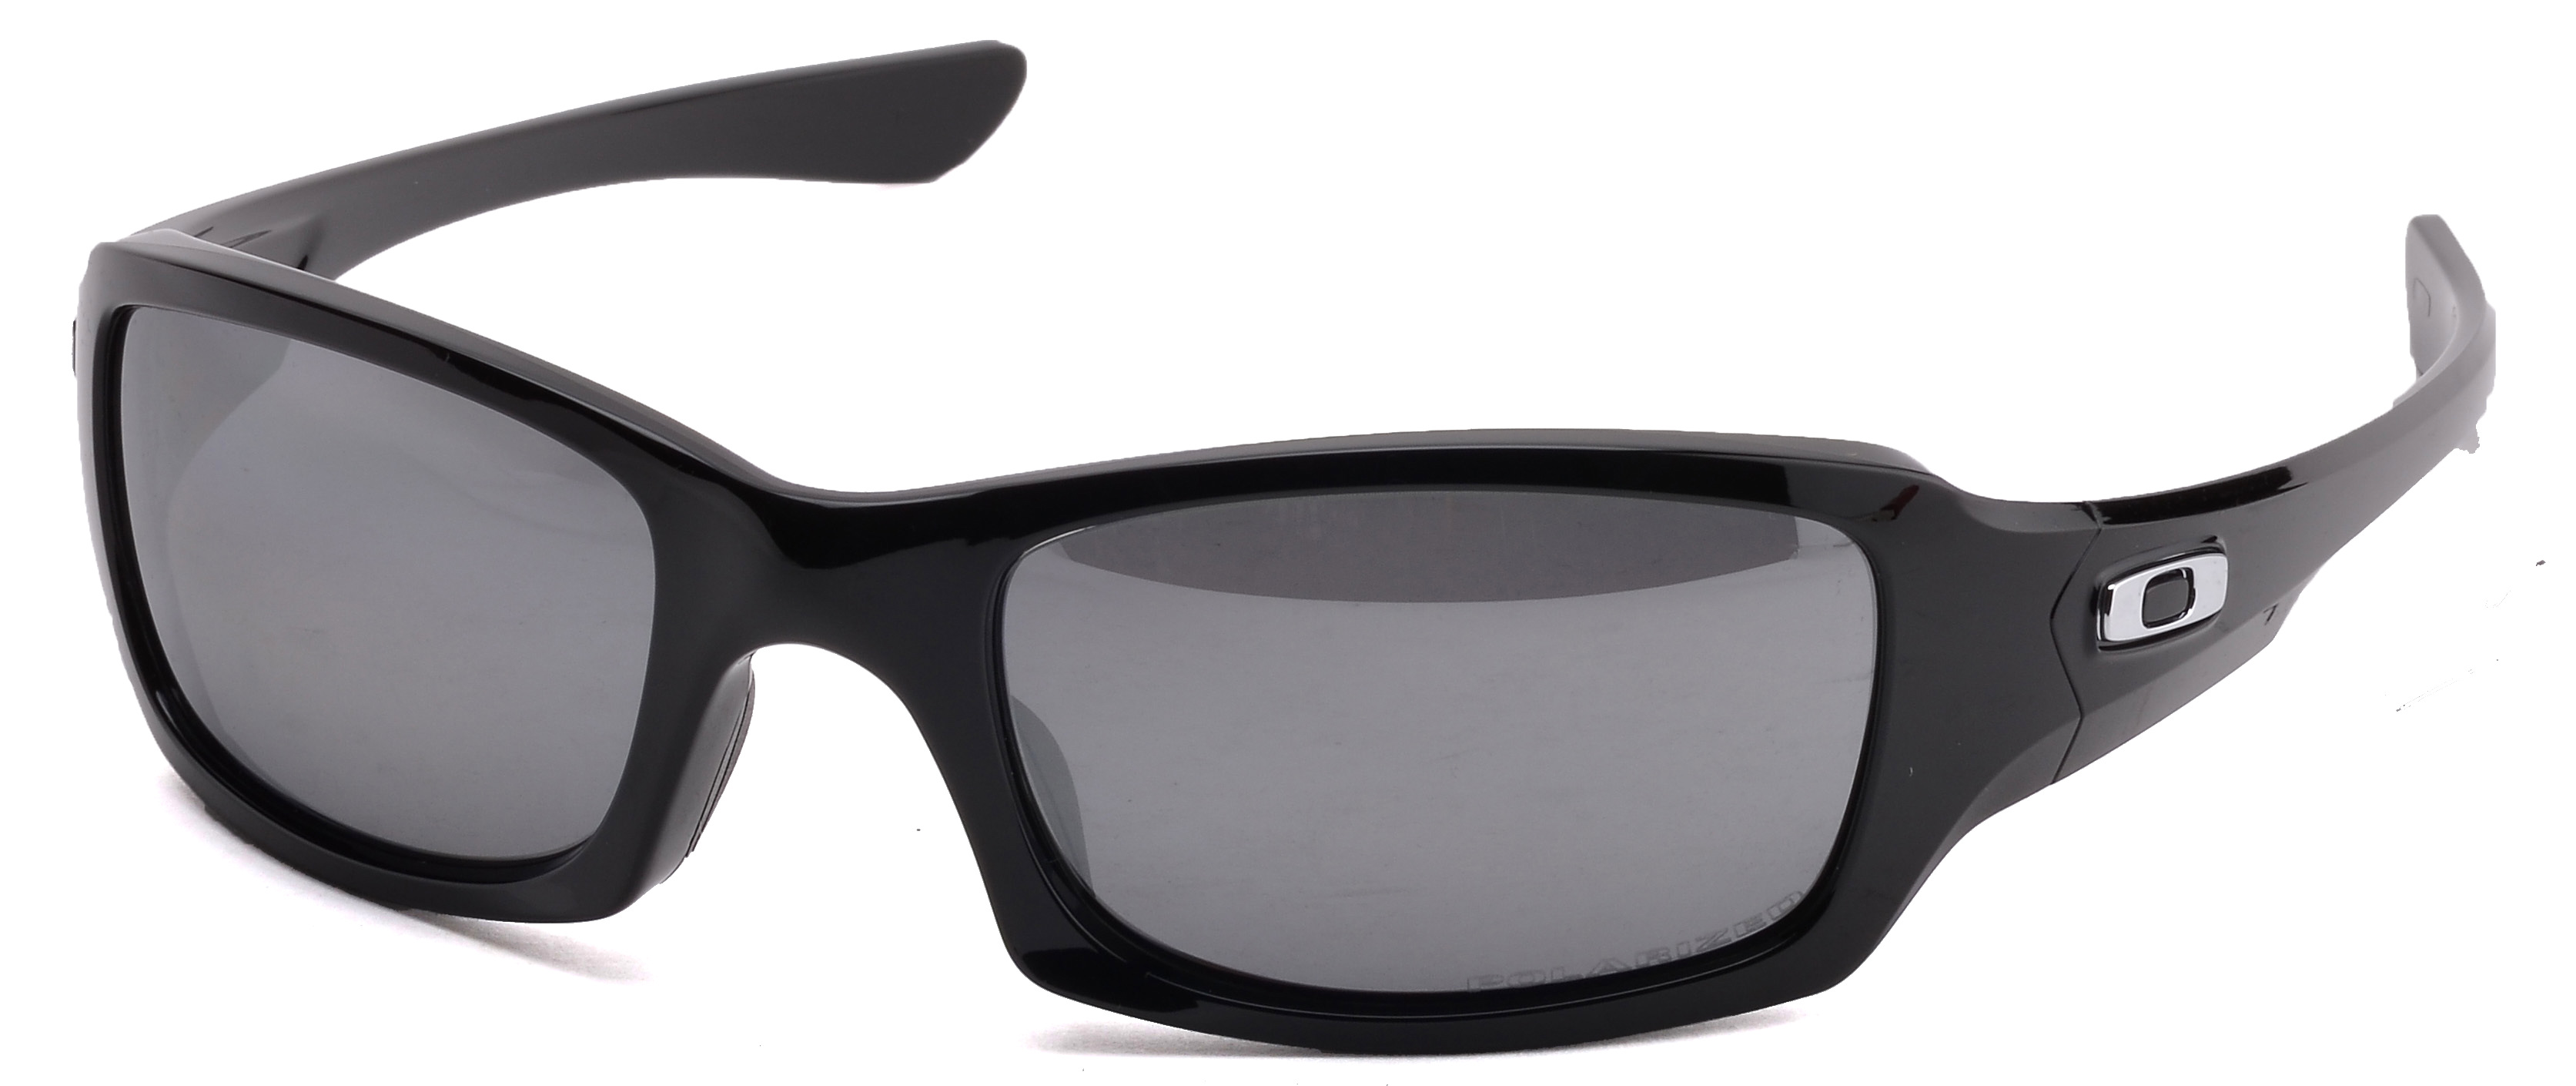 oakley jupiter squared sunglasses  oakley men 039 s sunglasses